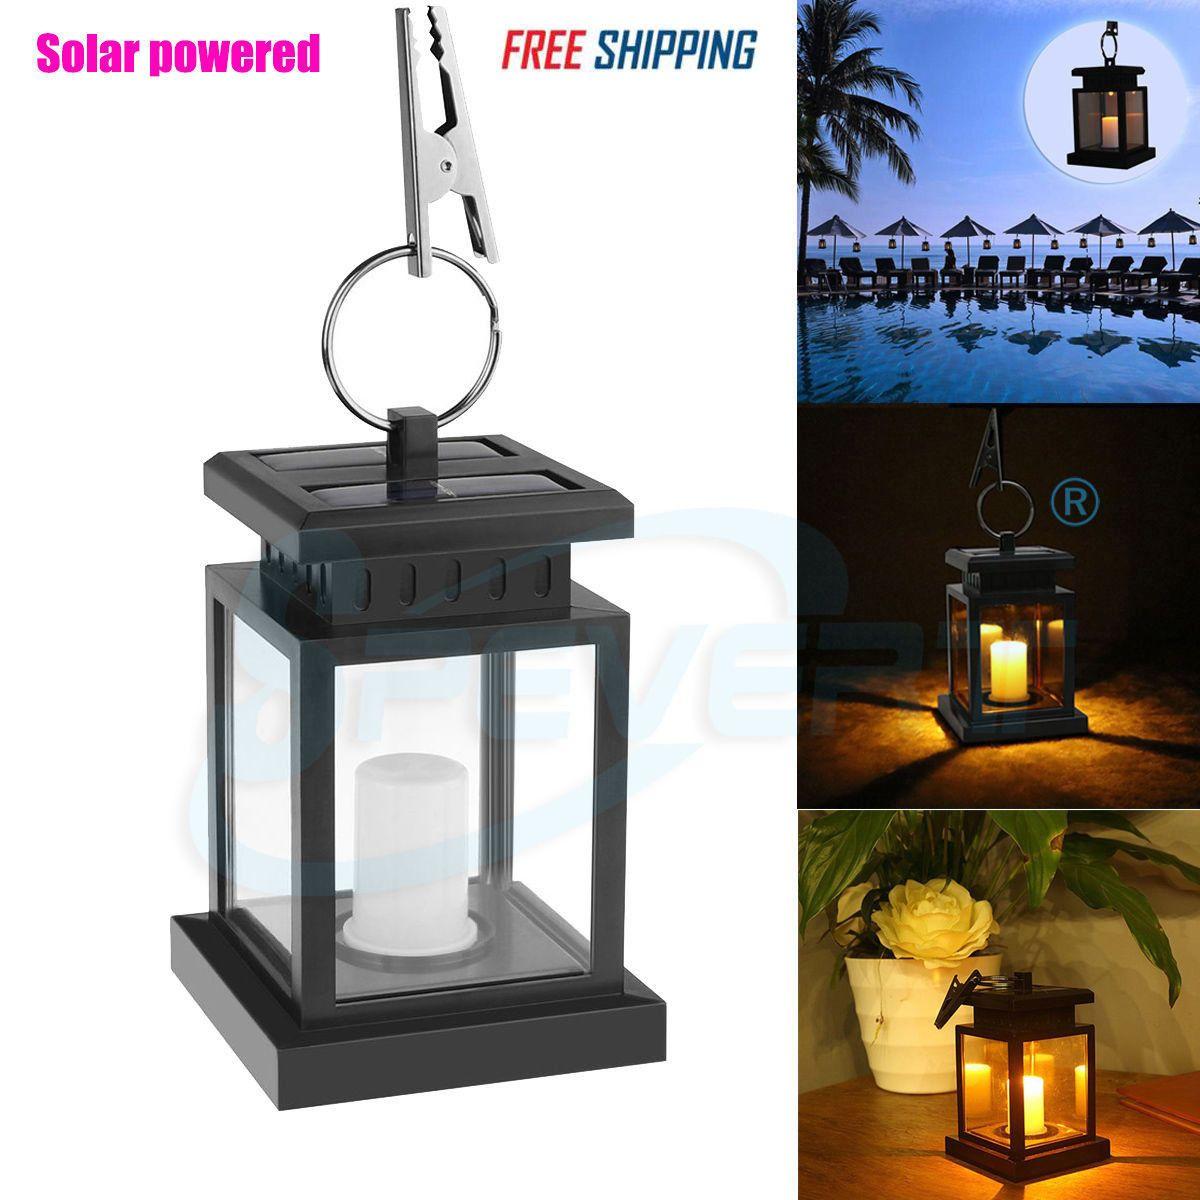 Solar Powered Led Candle Light Table Lantern Hanging Garden